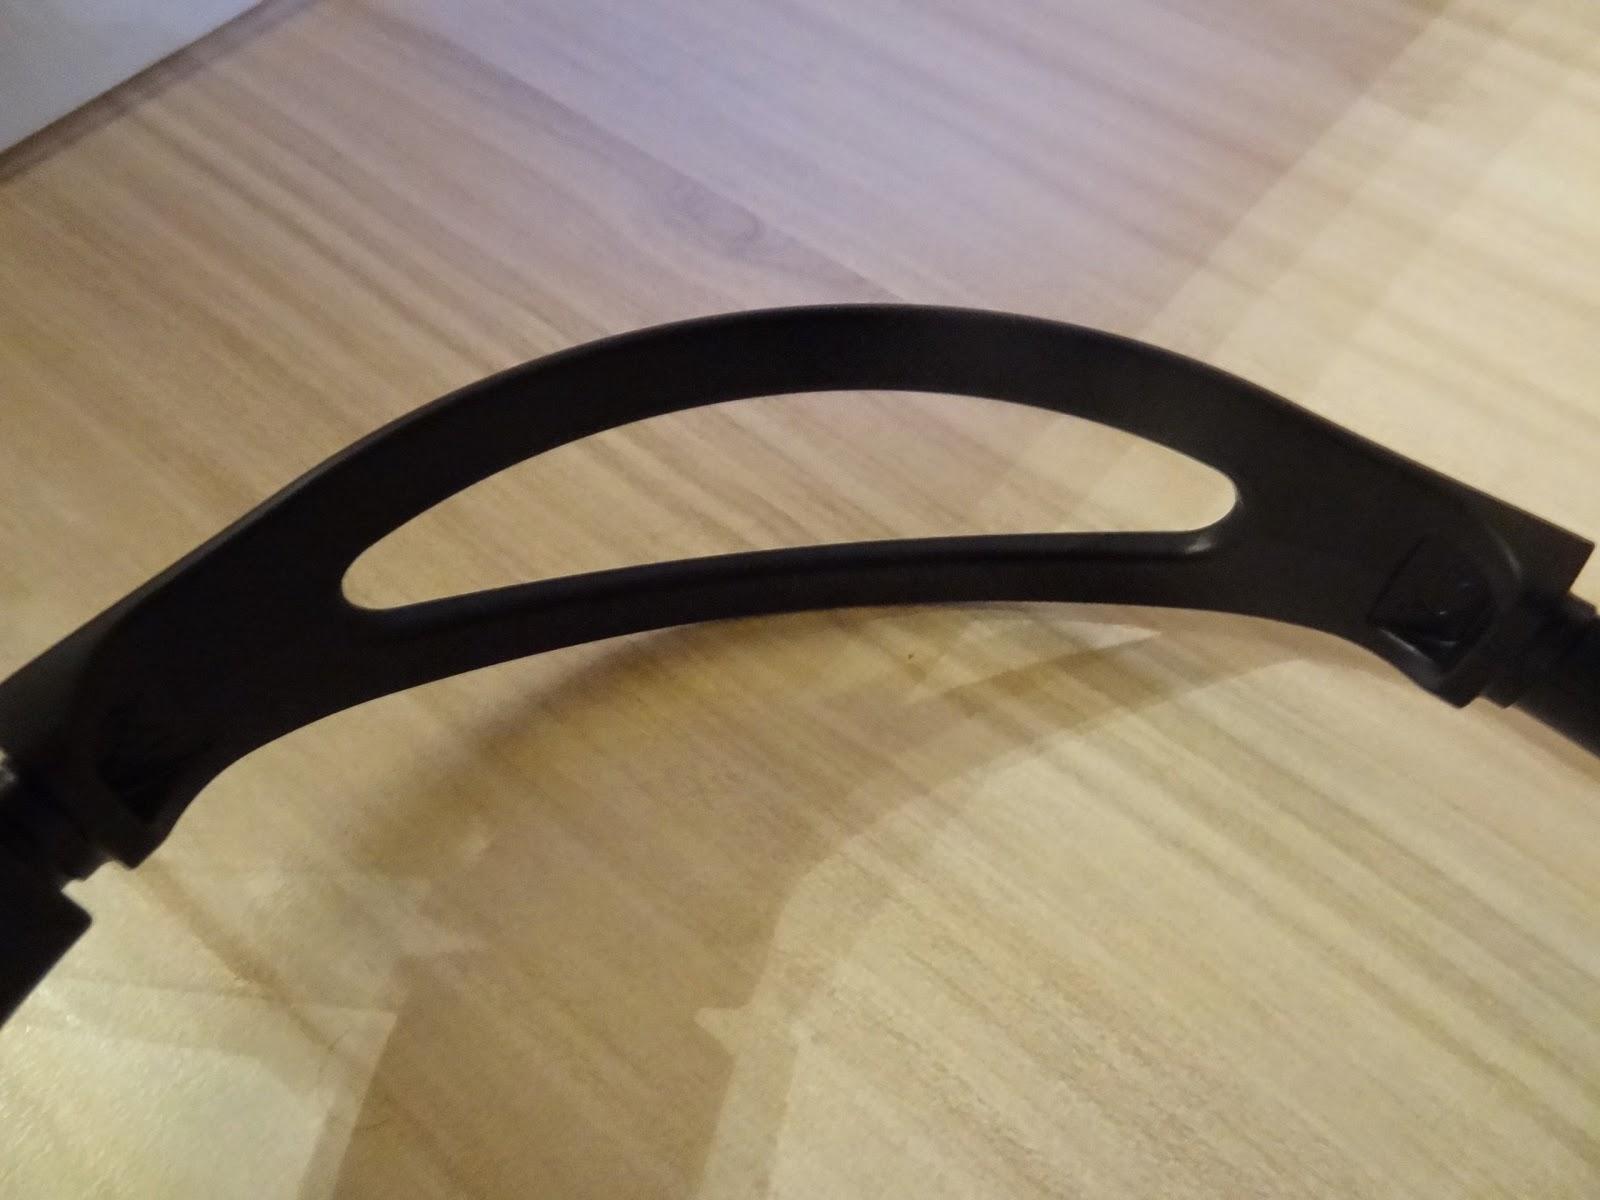 Sony MDR-XD150B headphones